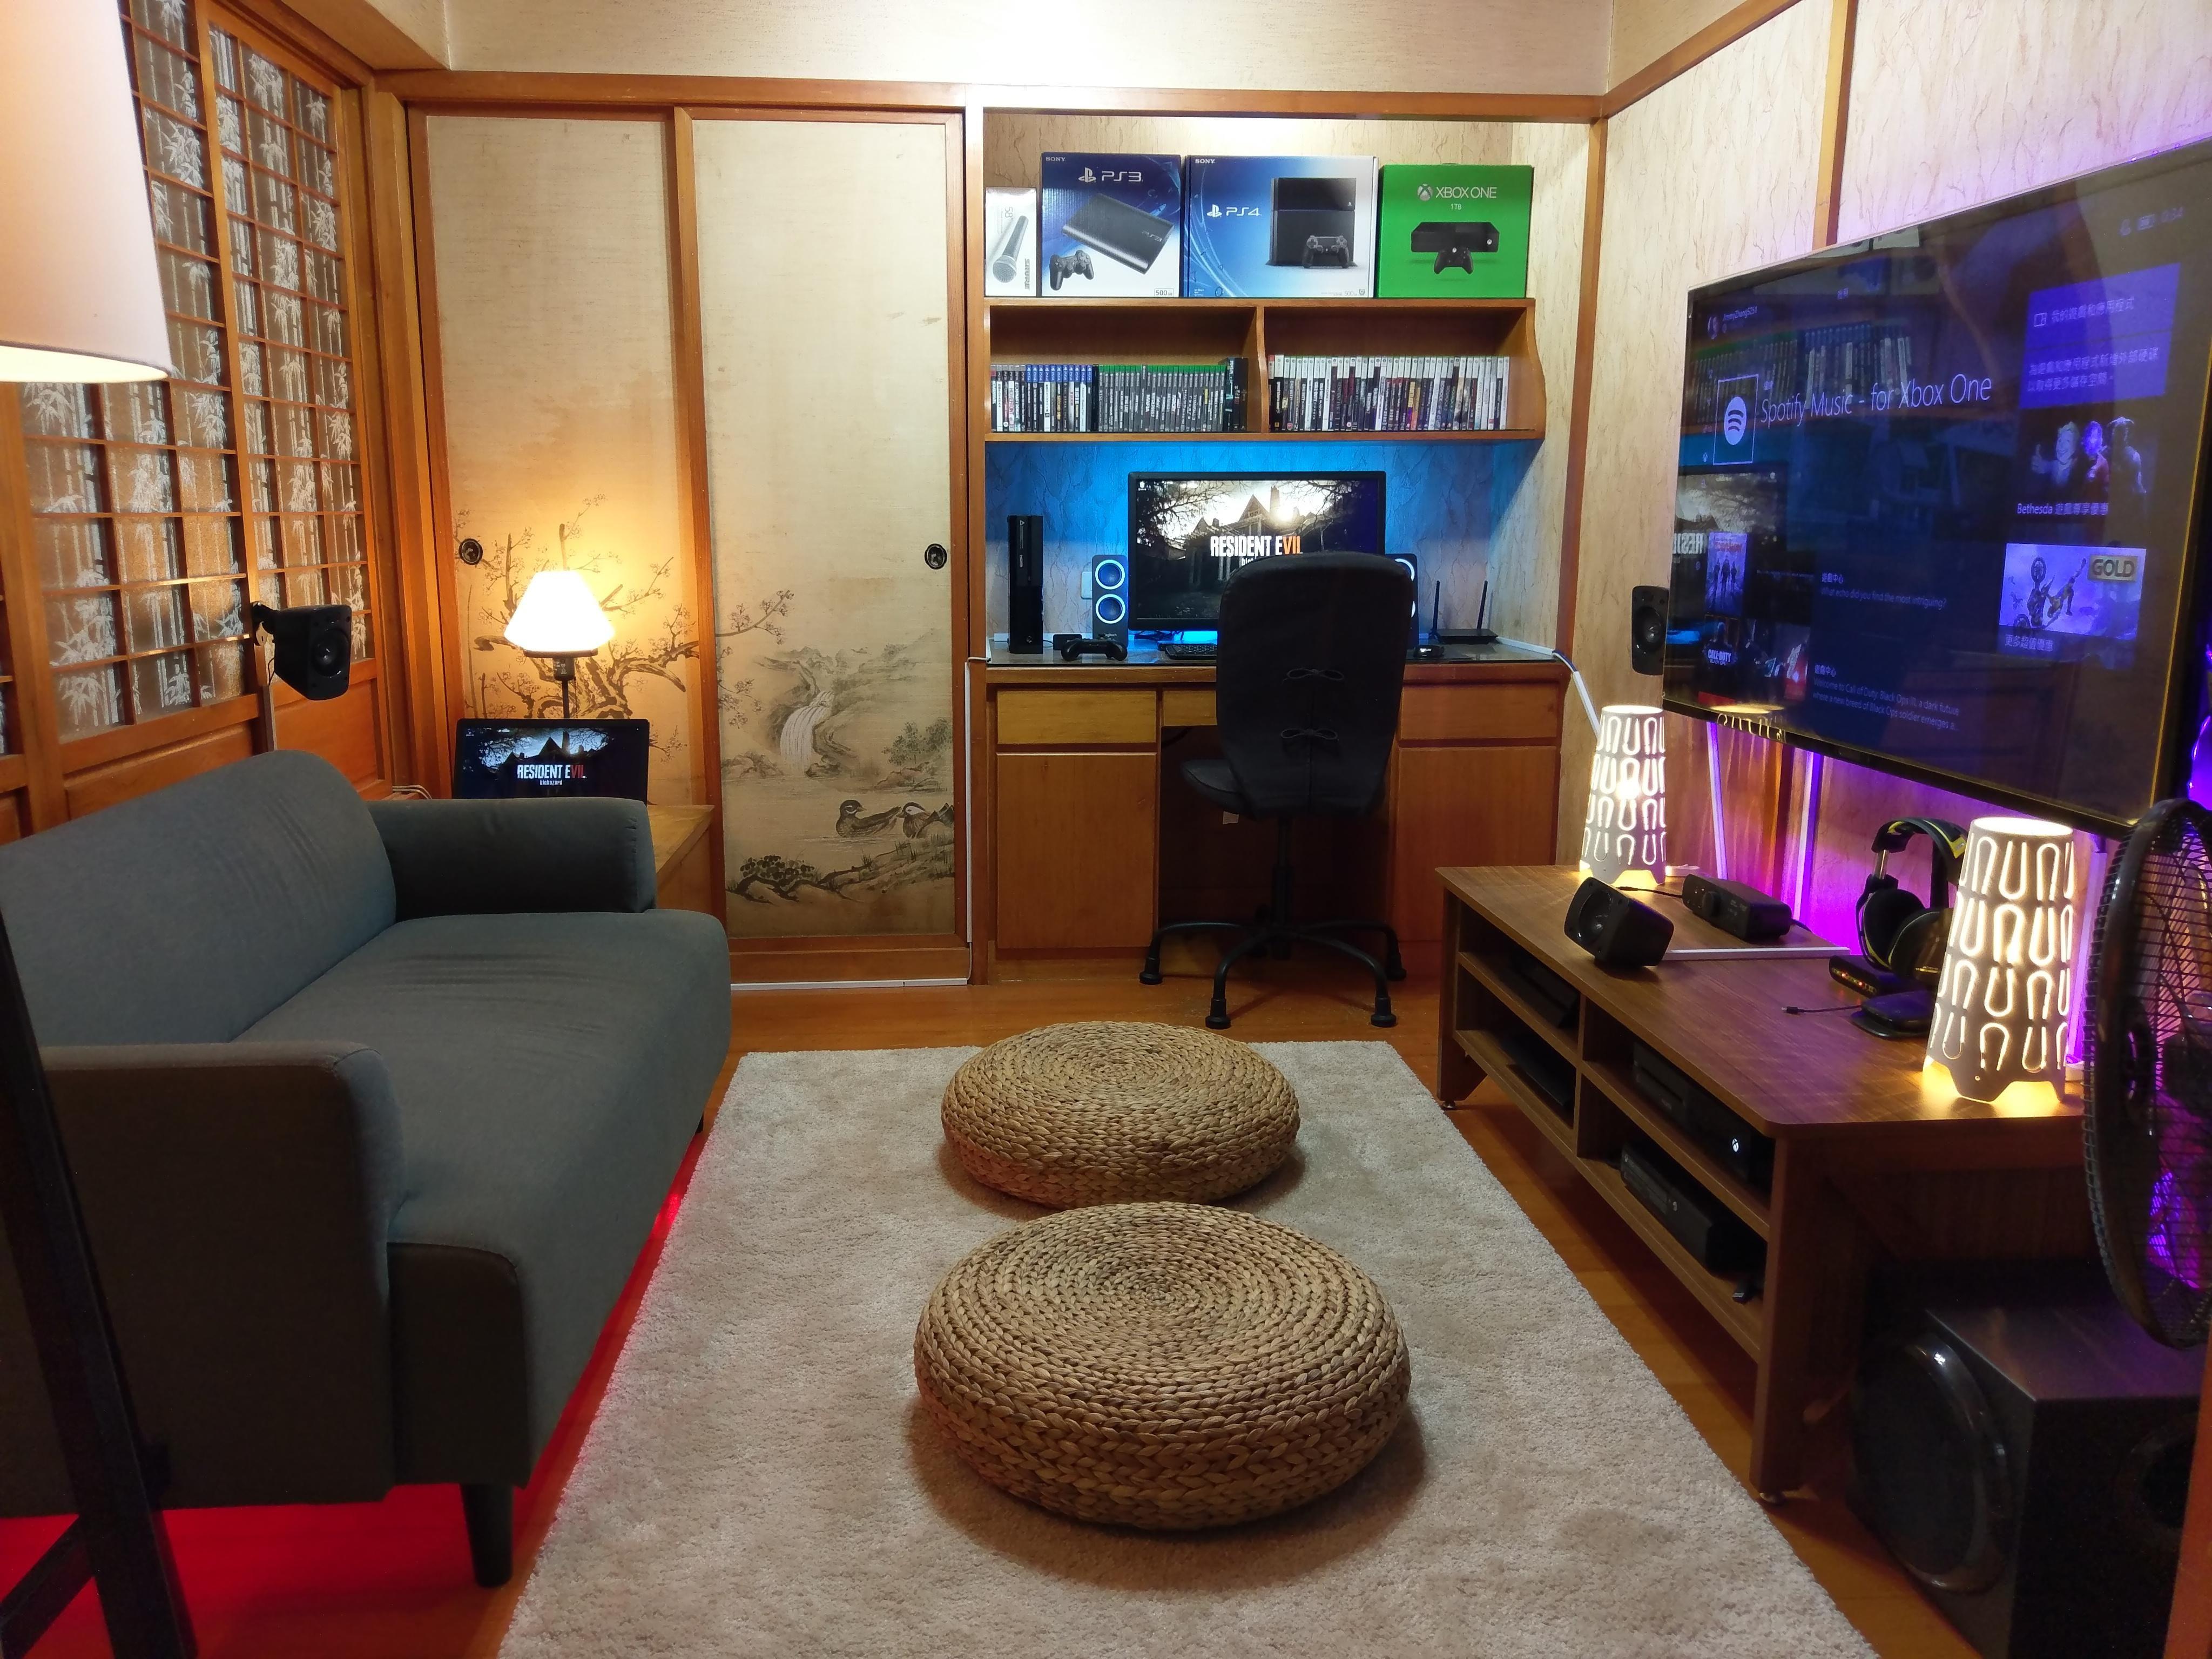 My Japan Style Gaming Setup Living Room Gaming Setup Gaming Setup Livingroom Layout #pc #gaming #in #living #room